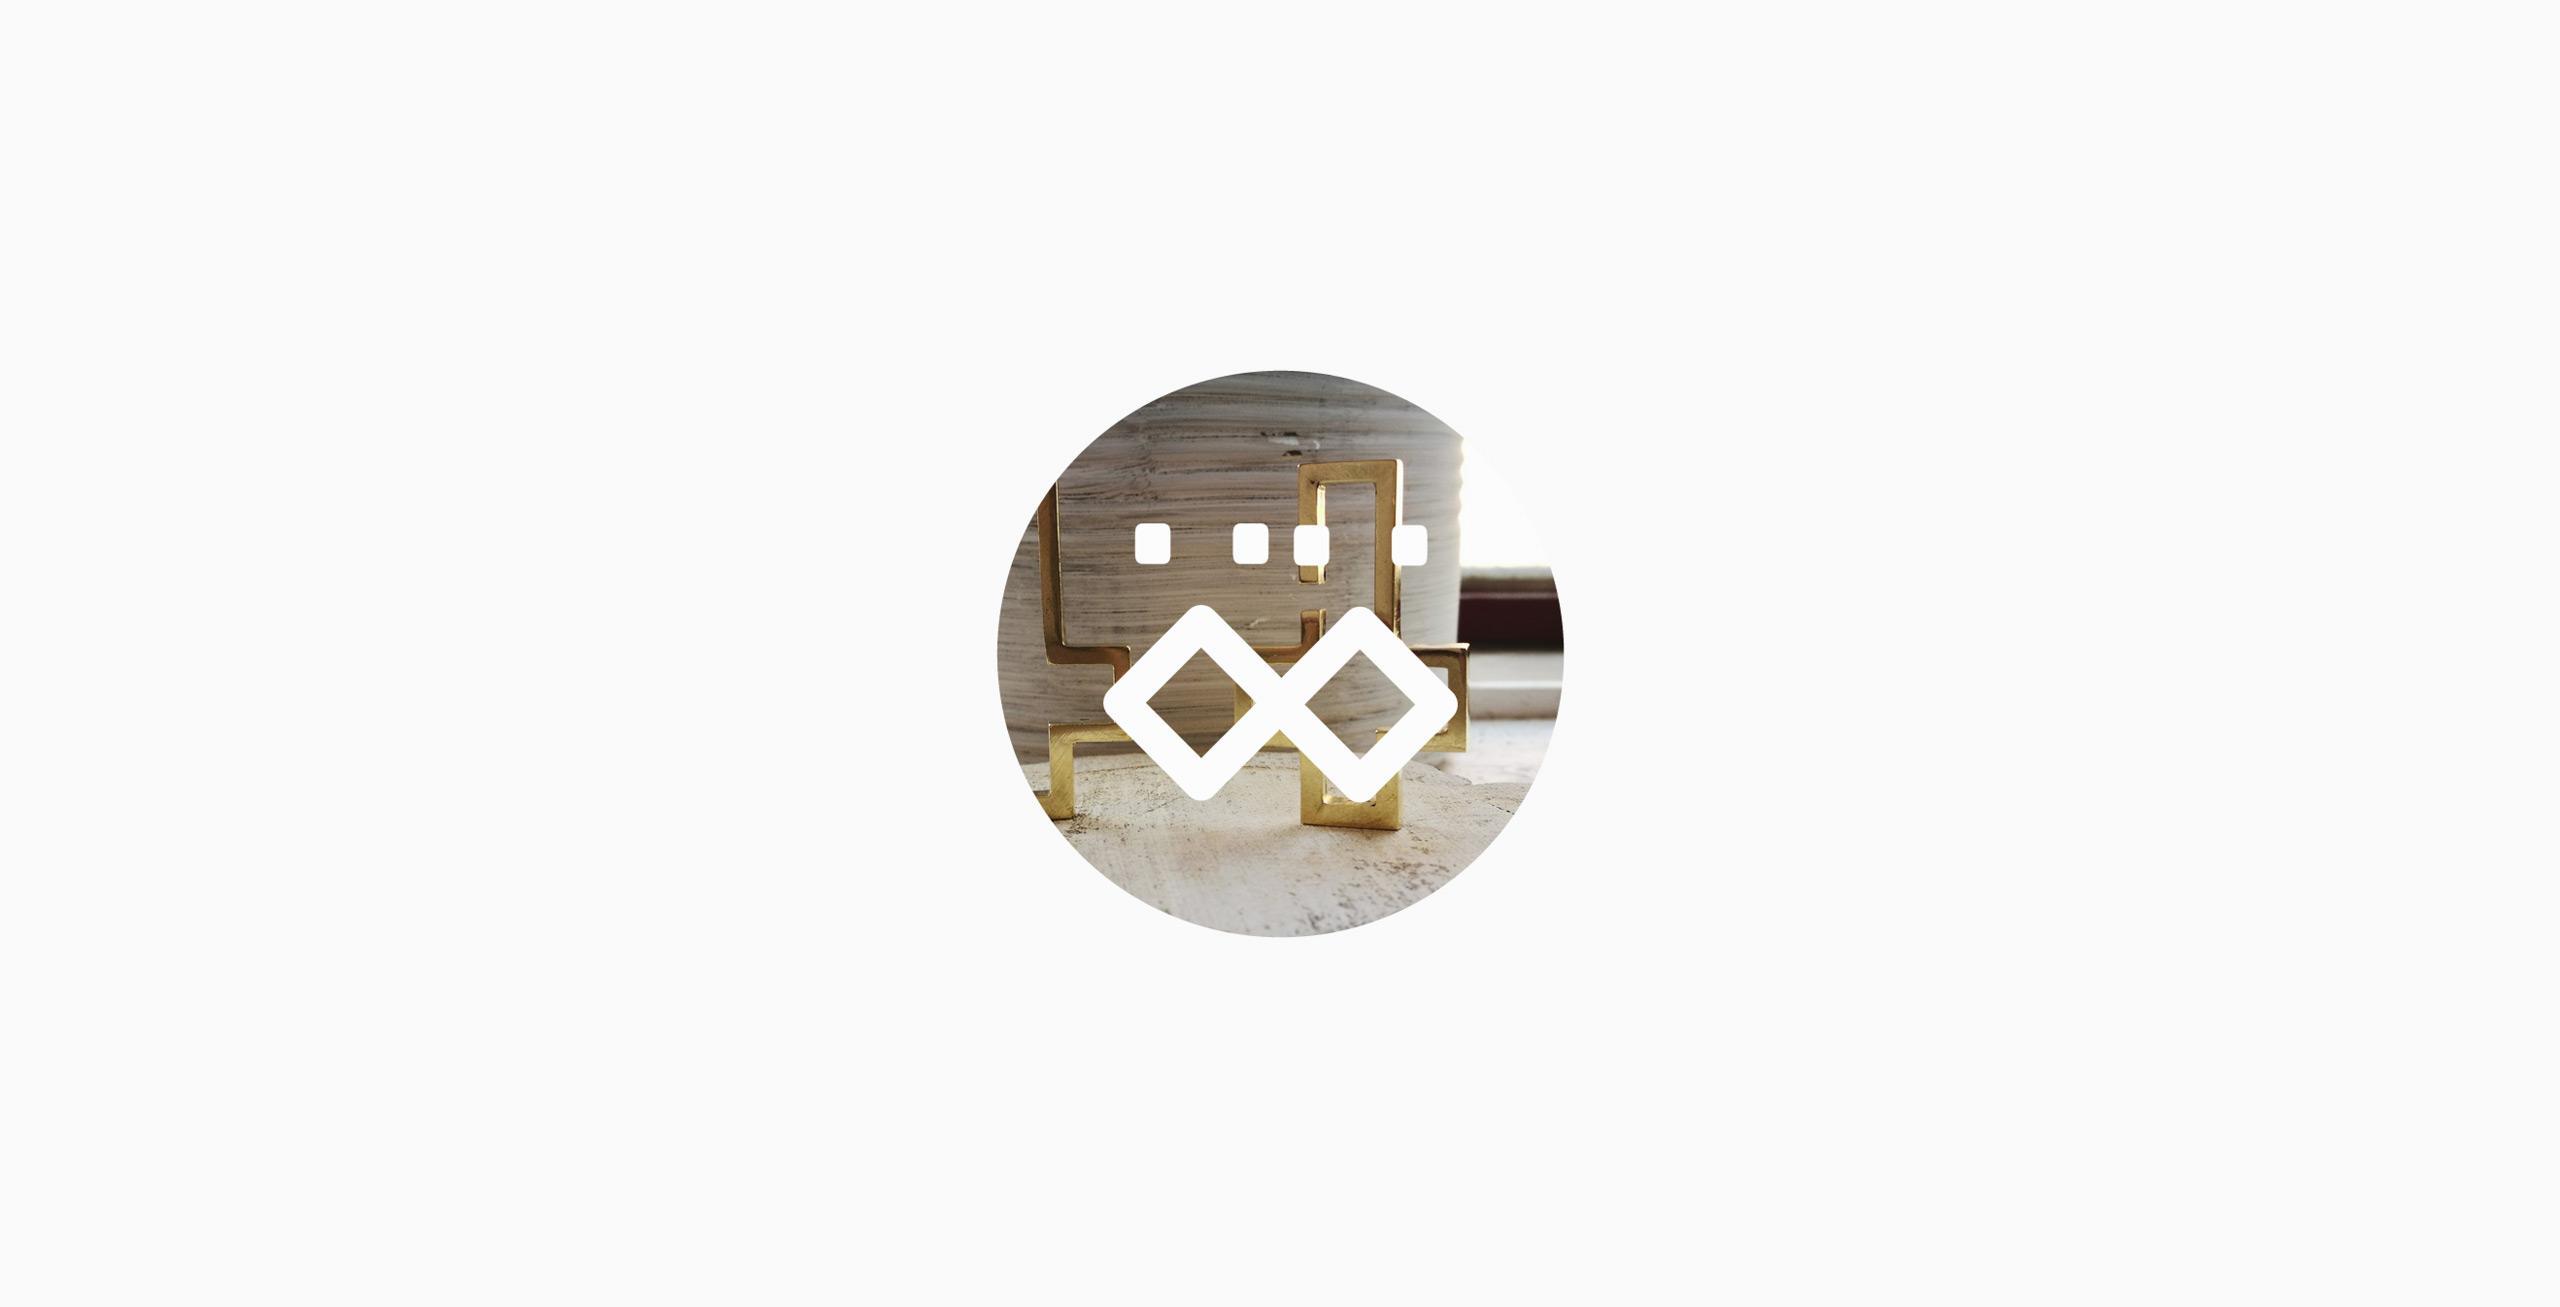 diseño de logotipo de jojo jewels